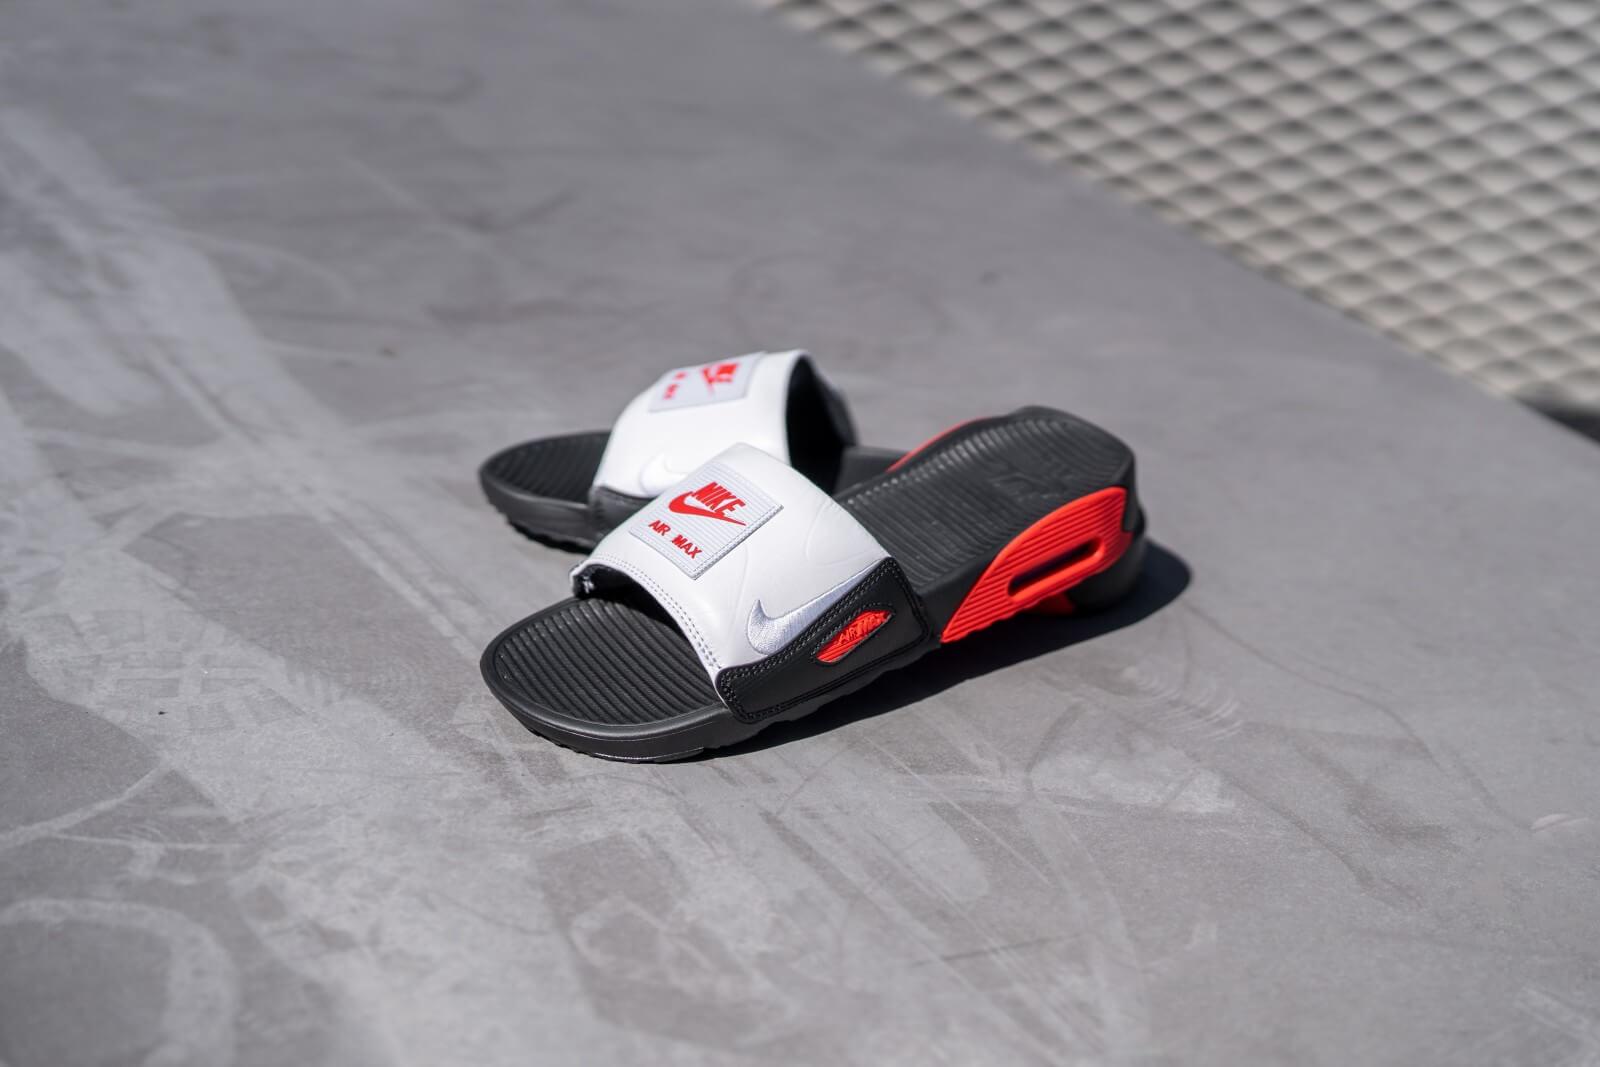 Nike Air Max 90 Slide BlackWhite Chili Red BQ4635 003